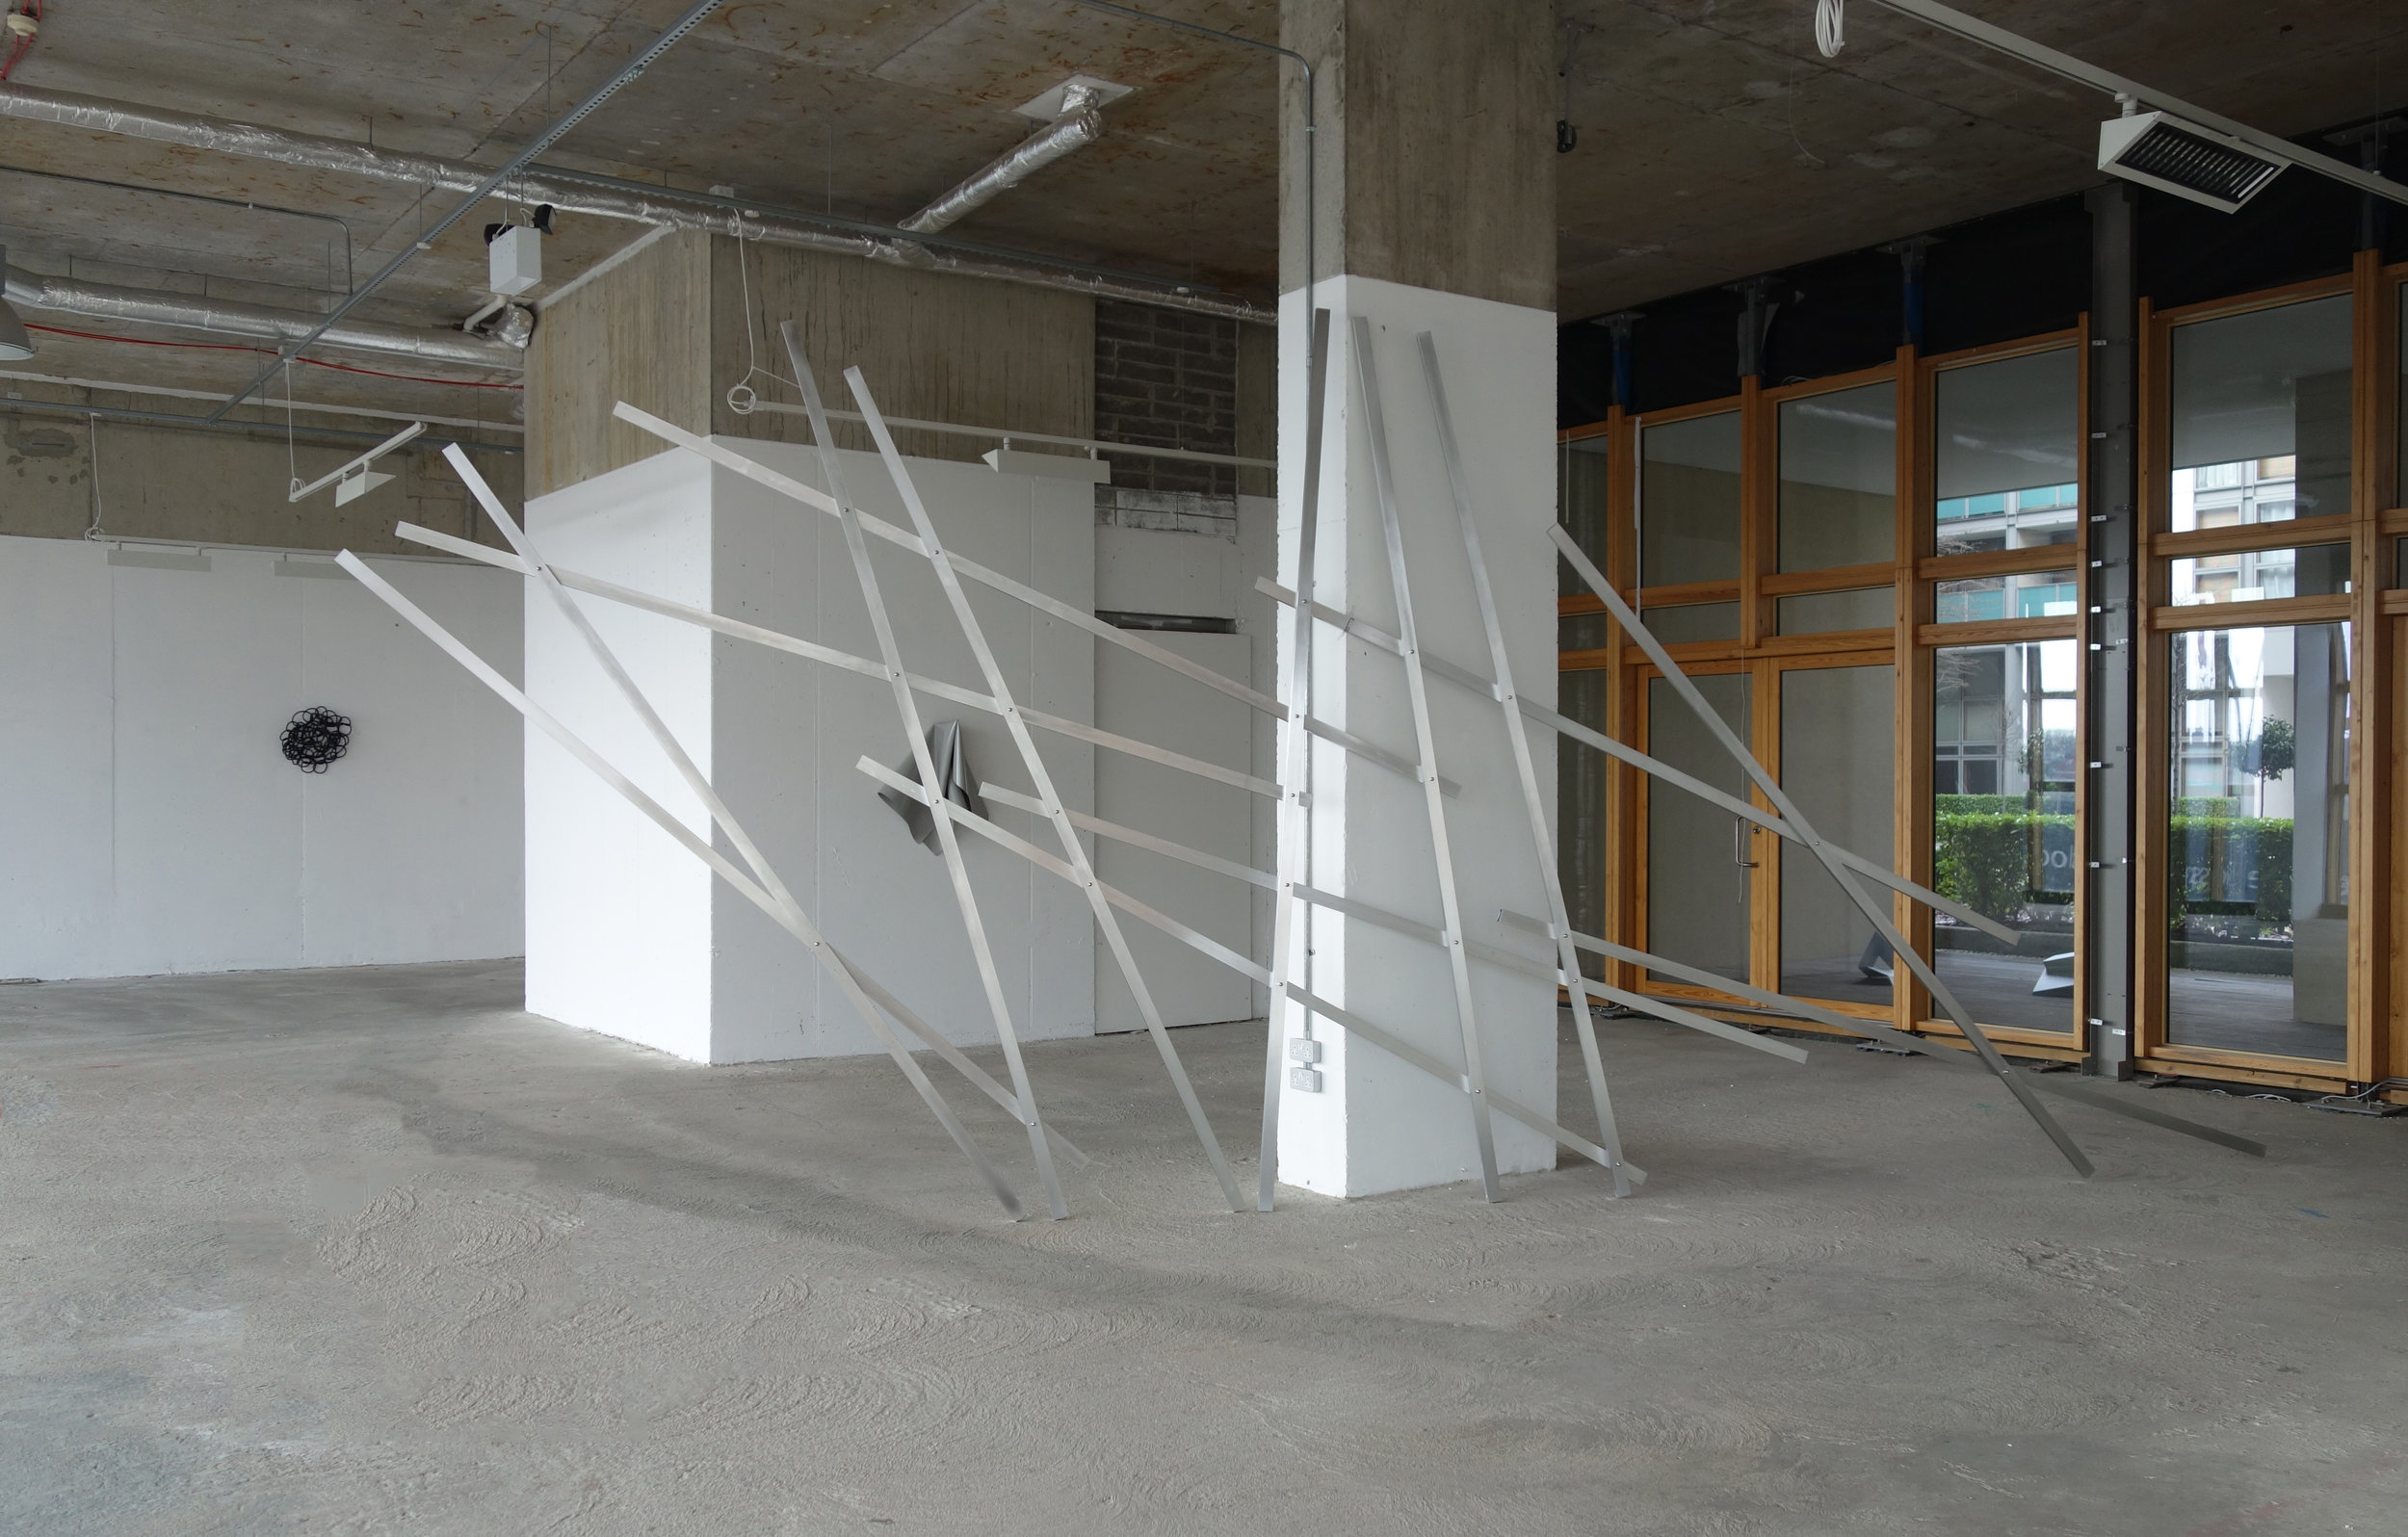 o.T., (untitled) 2009,  750 x 320 x 7 cm, aluminium, steel screws